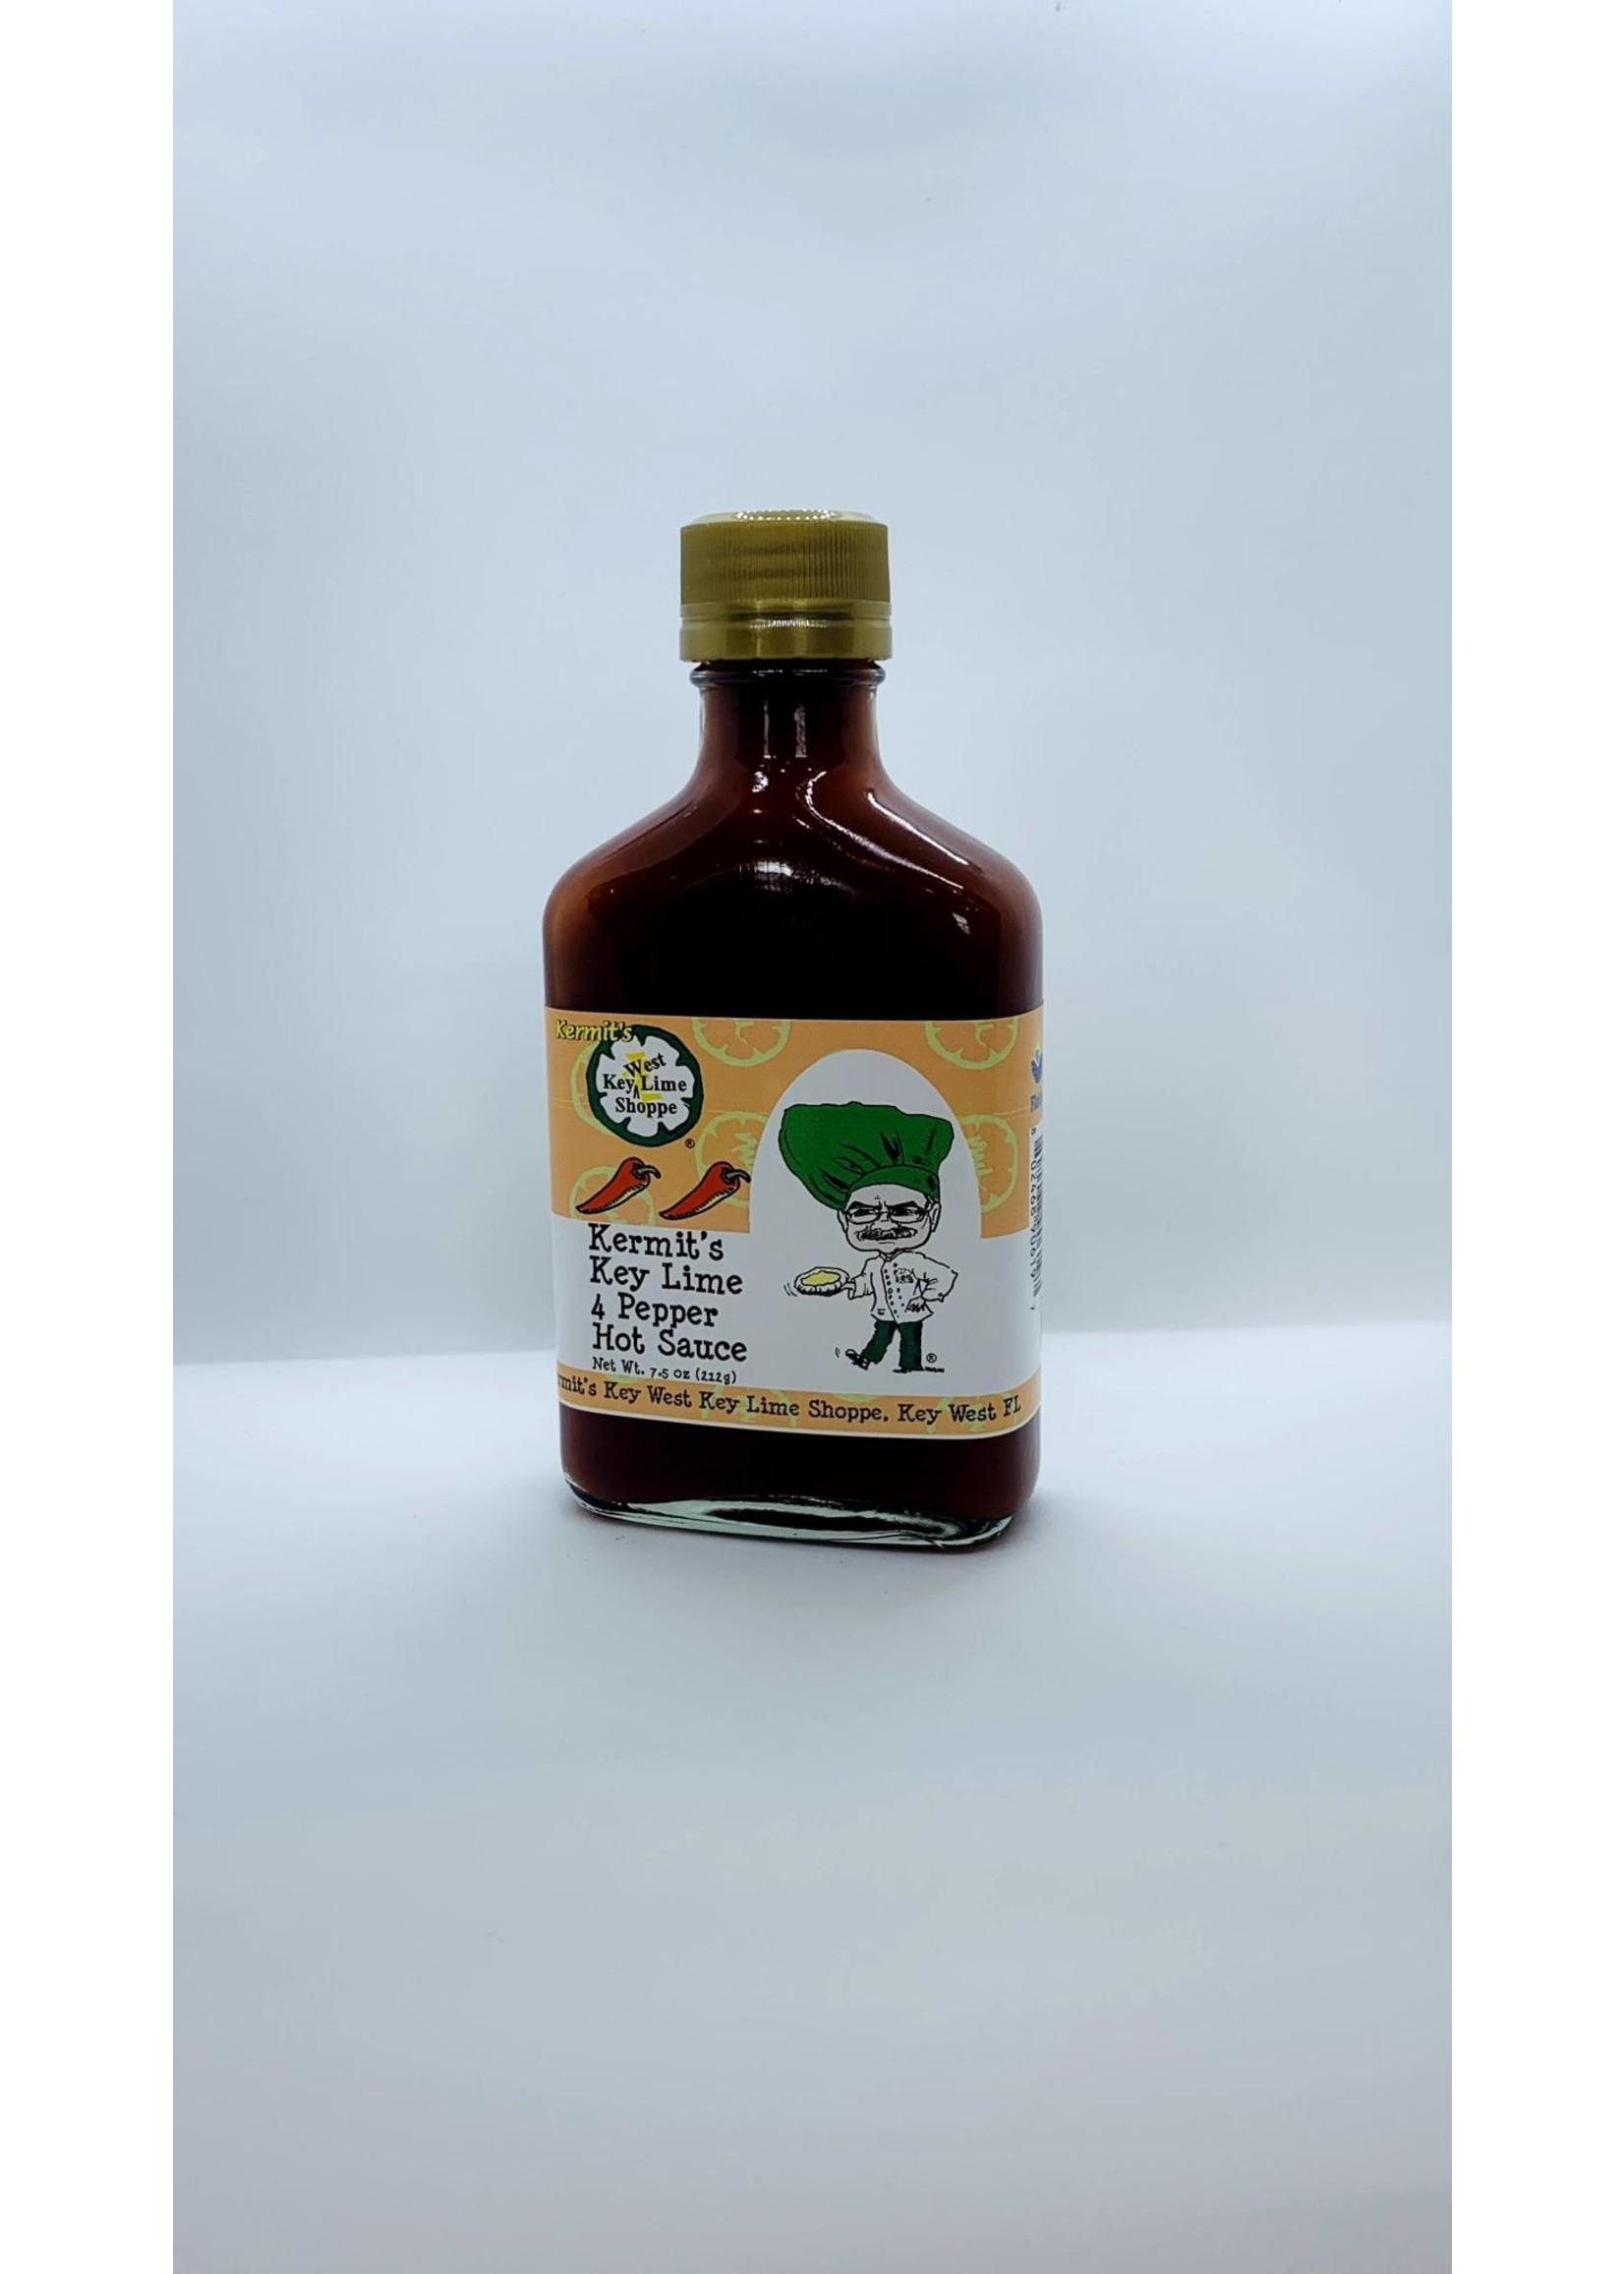 Kermit's Key Lime Four Pepper Hot Sauce 7.5 oz